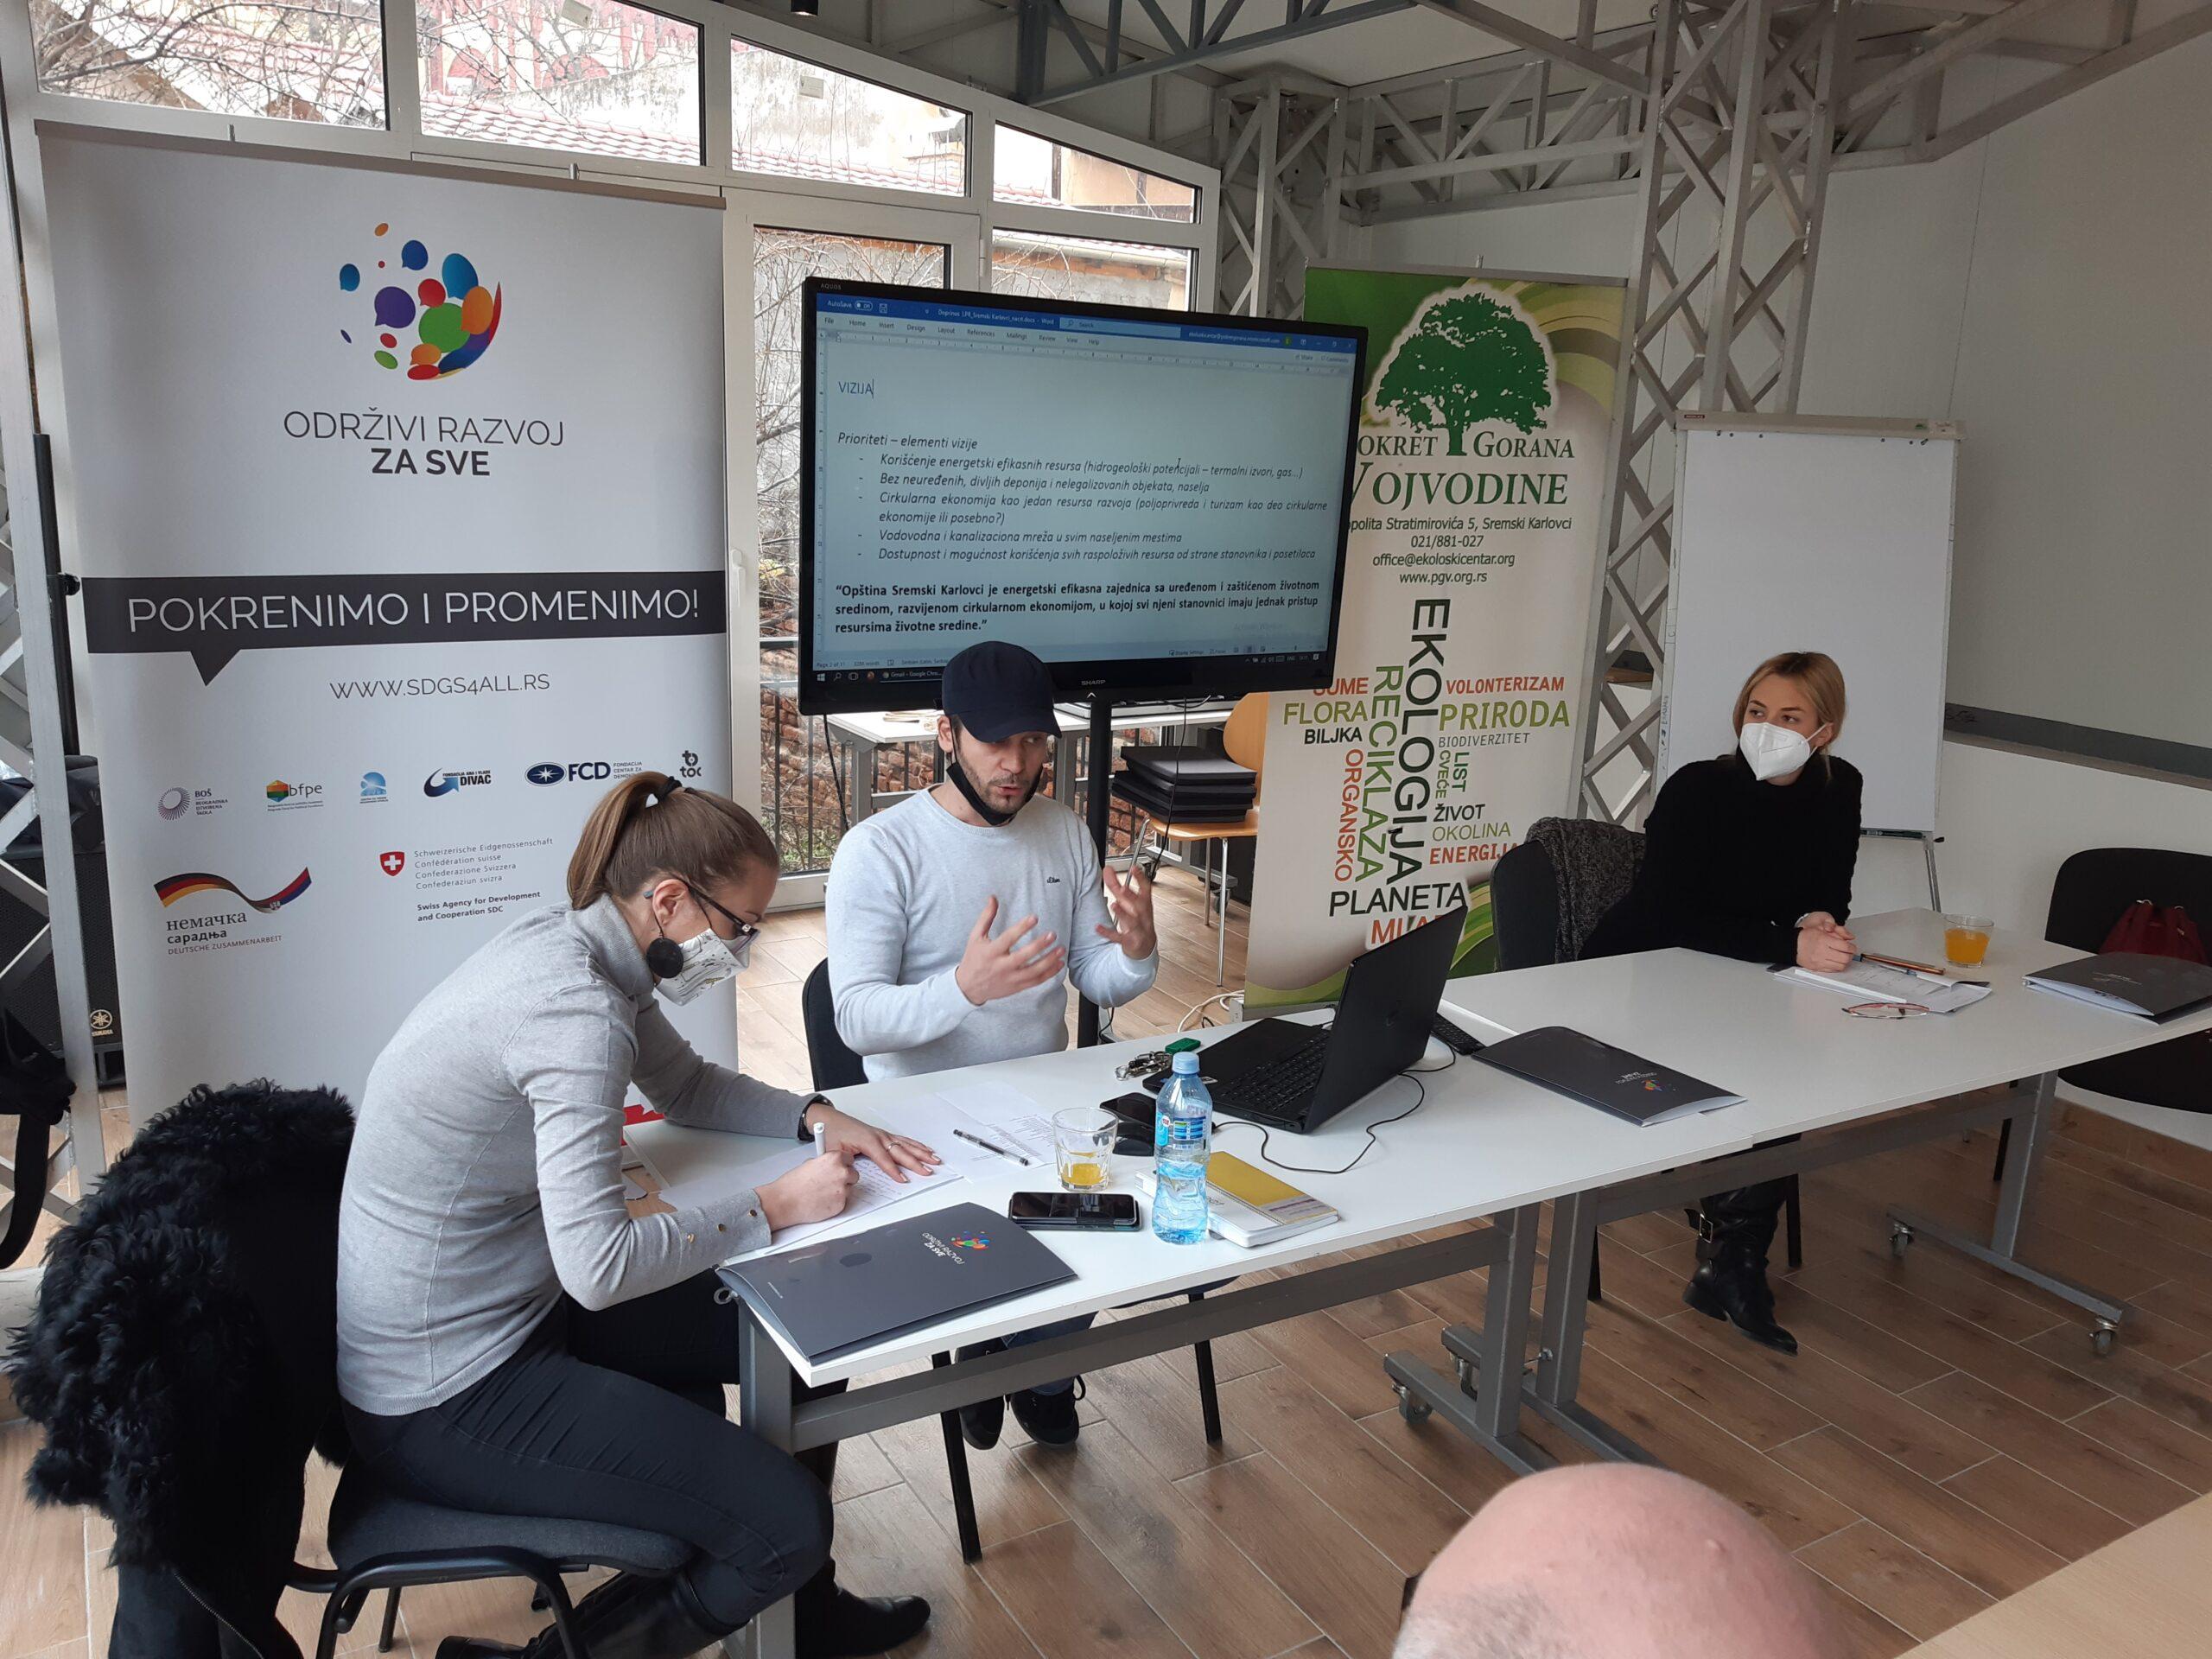 Sremski Karlovci and Priboj: Towards New Development Plans and a Healthy Environment